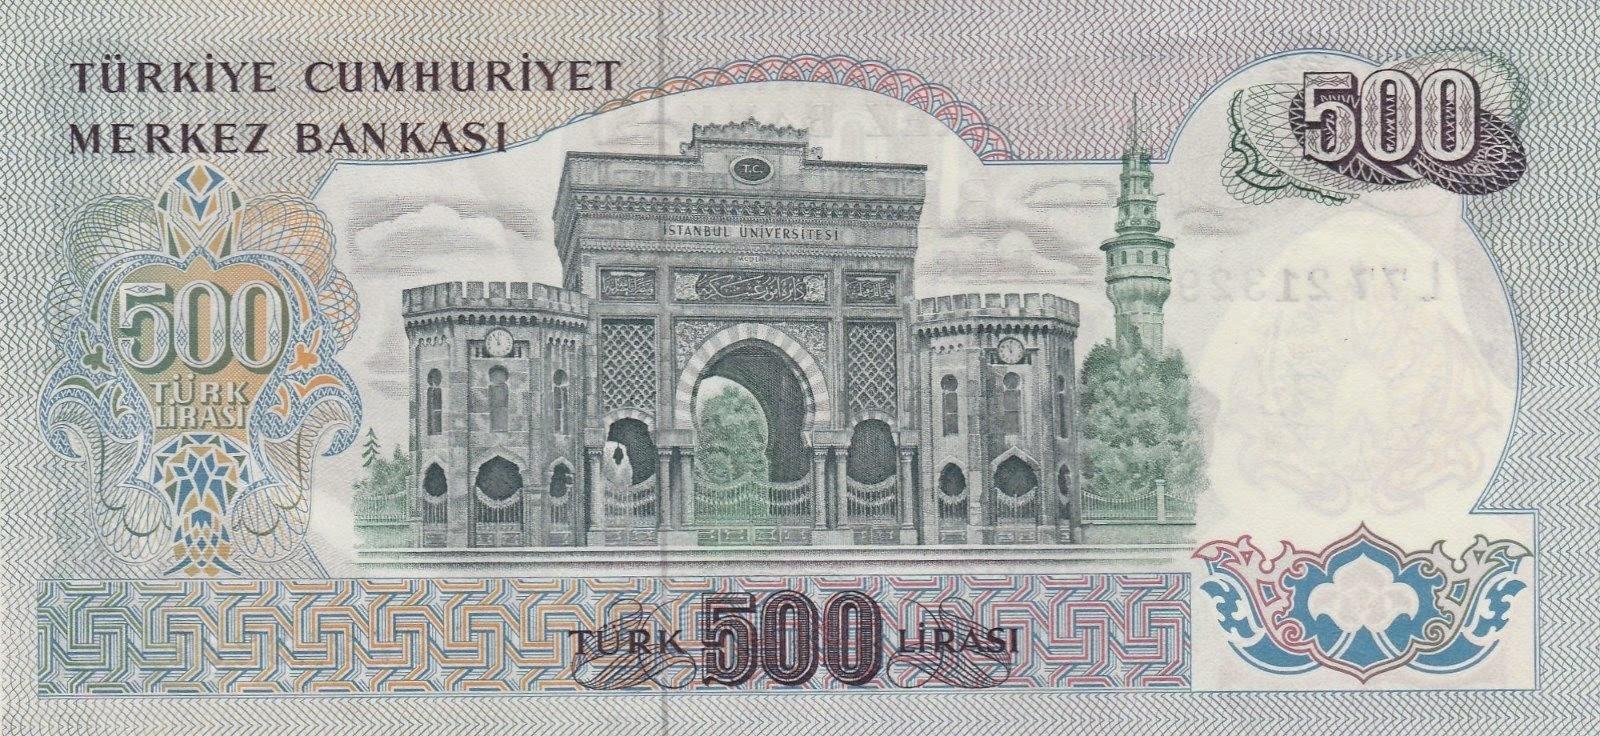 "Turkey currency money 500 Türk Lirasi ""Turkish Lira"" note 1970 Main Gate of İstanbul University"